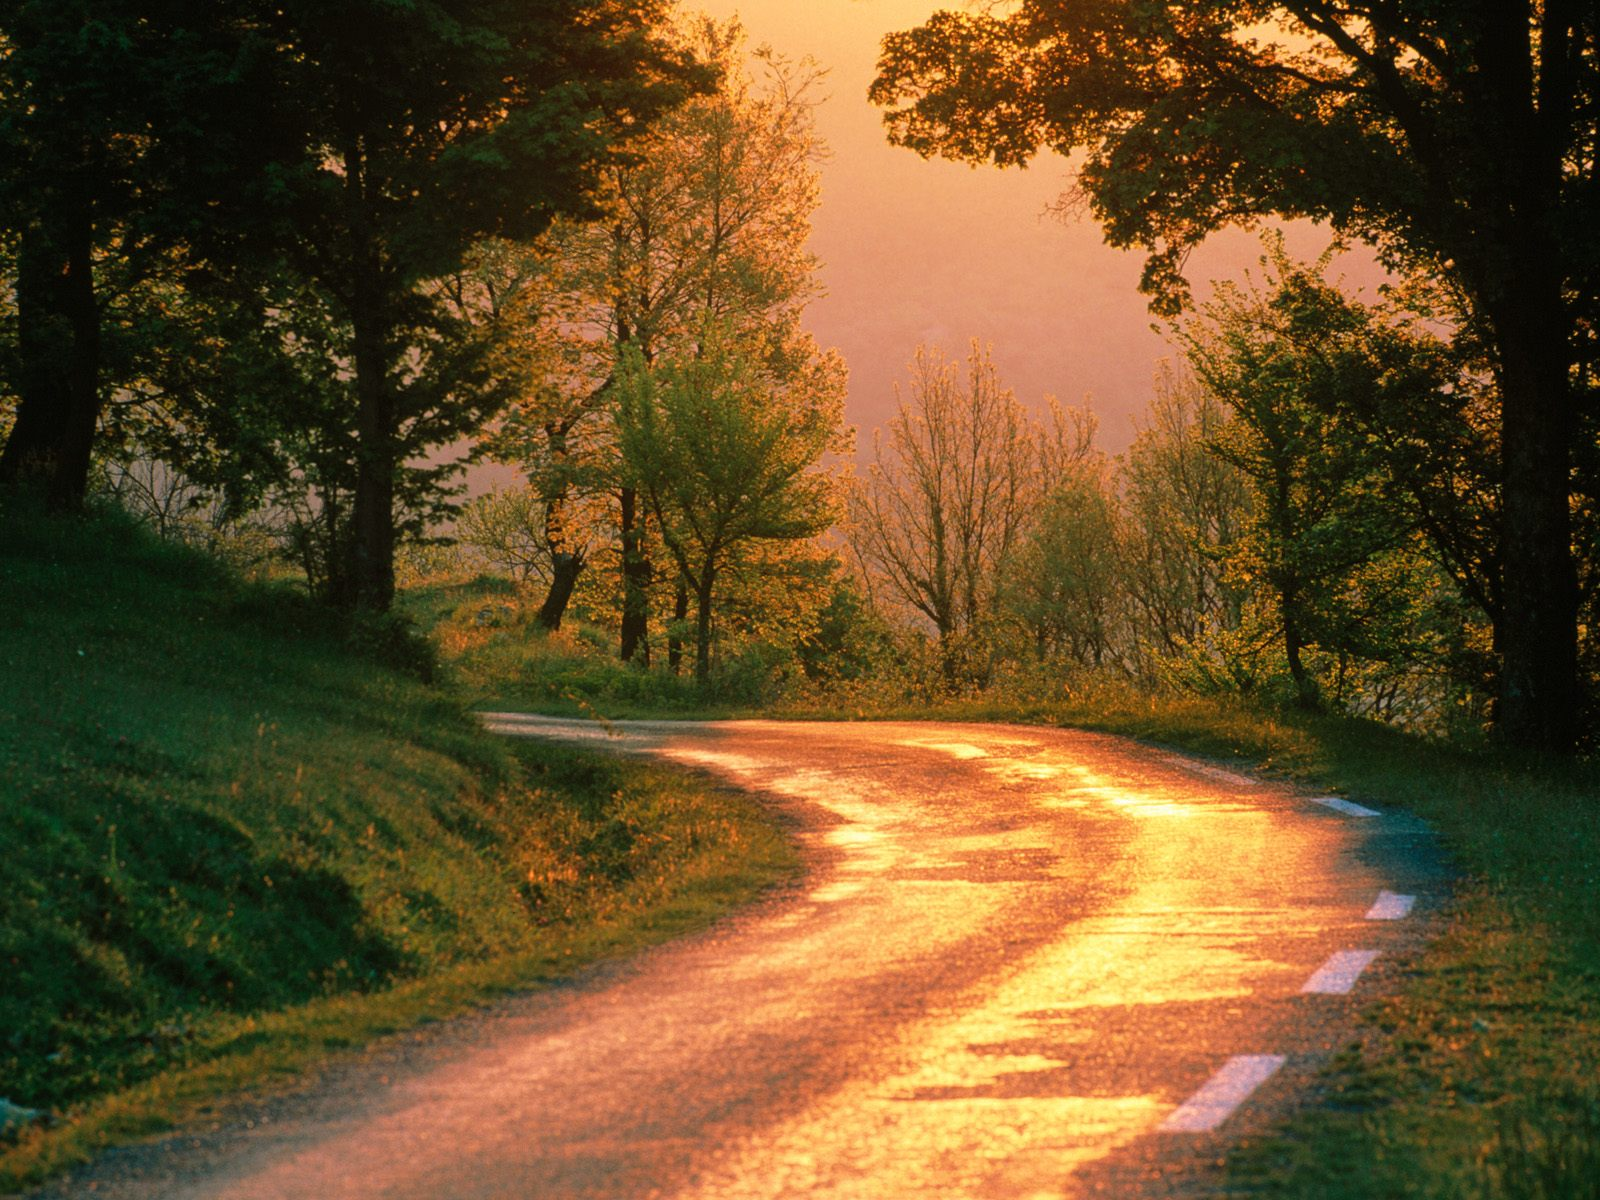 http://1.bp.blogspot.com/-7_-vDfcEg2Y/TtetSDScSuI/AAAAAAAAAWU/yXZ6hGAyVlI/s1600/nature-wallpaper-golden-road-france.jpg